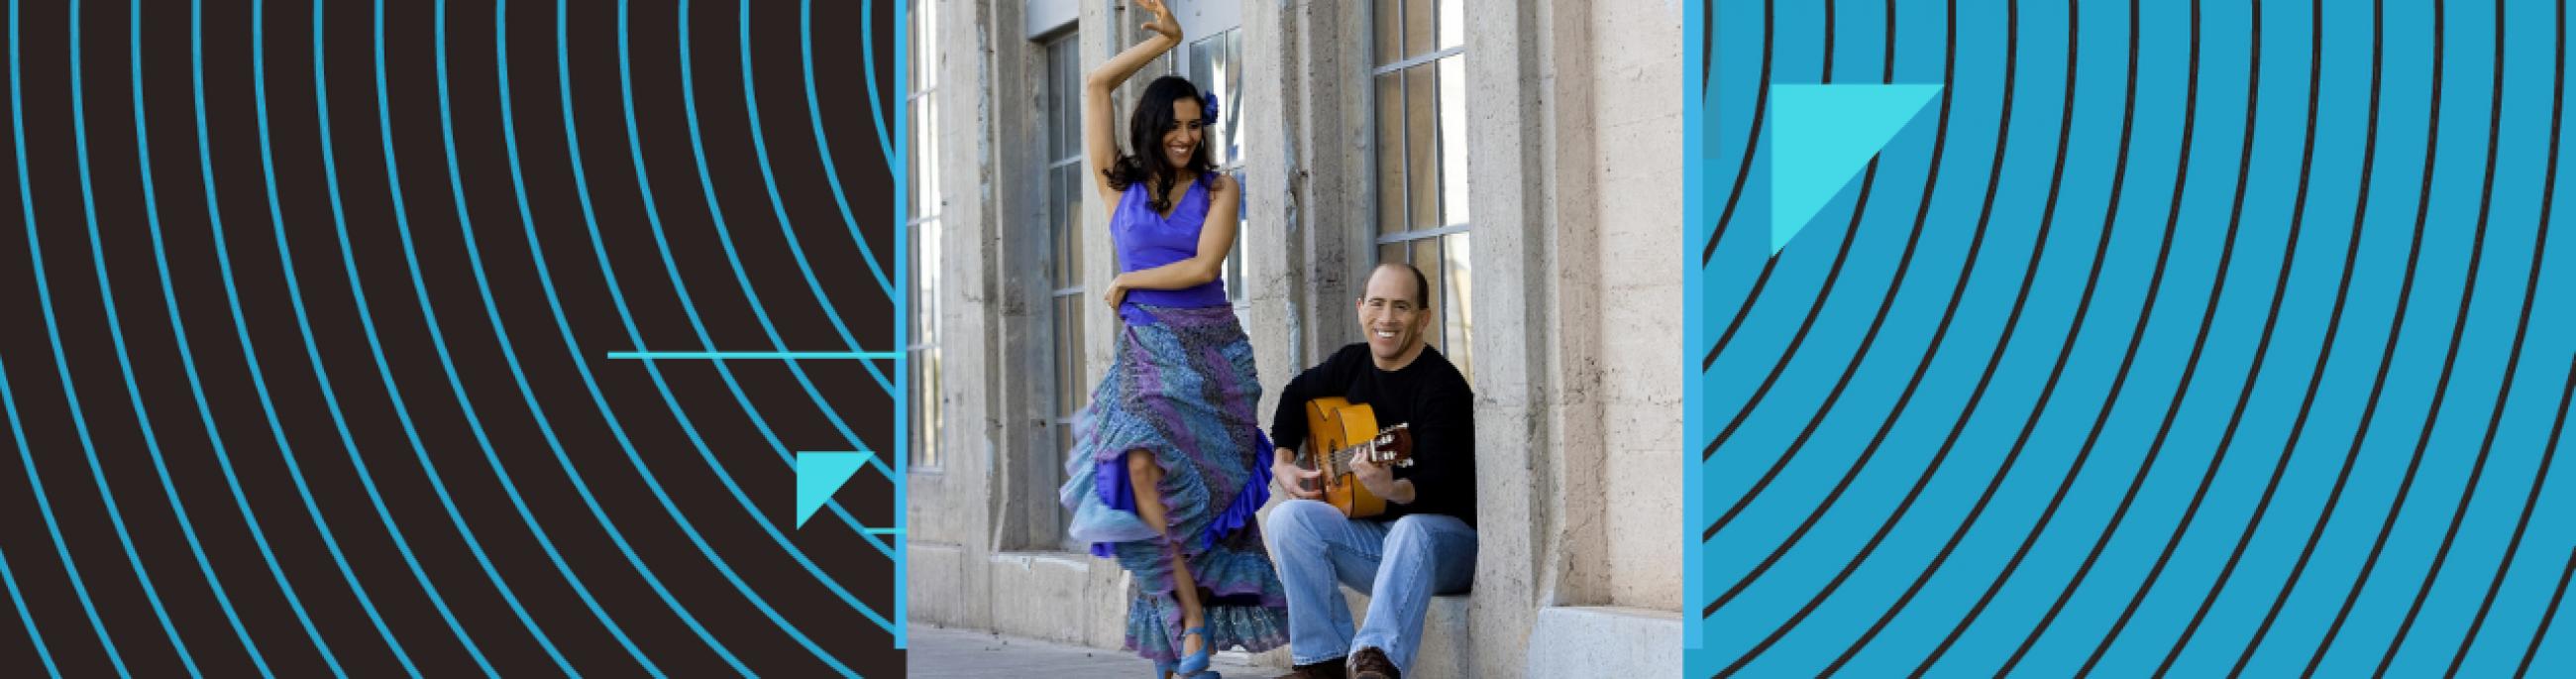 CCA Anywhere Jacome Flamenco